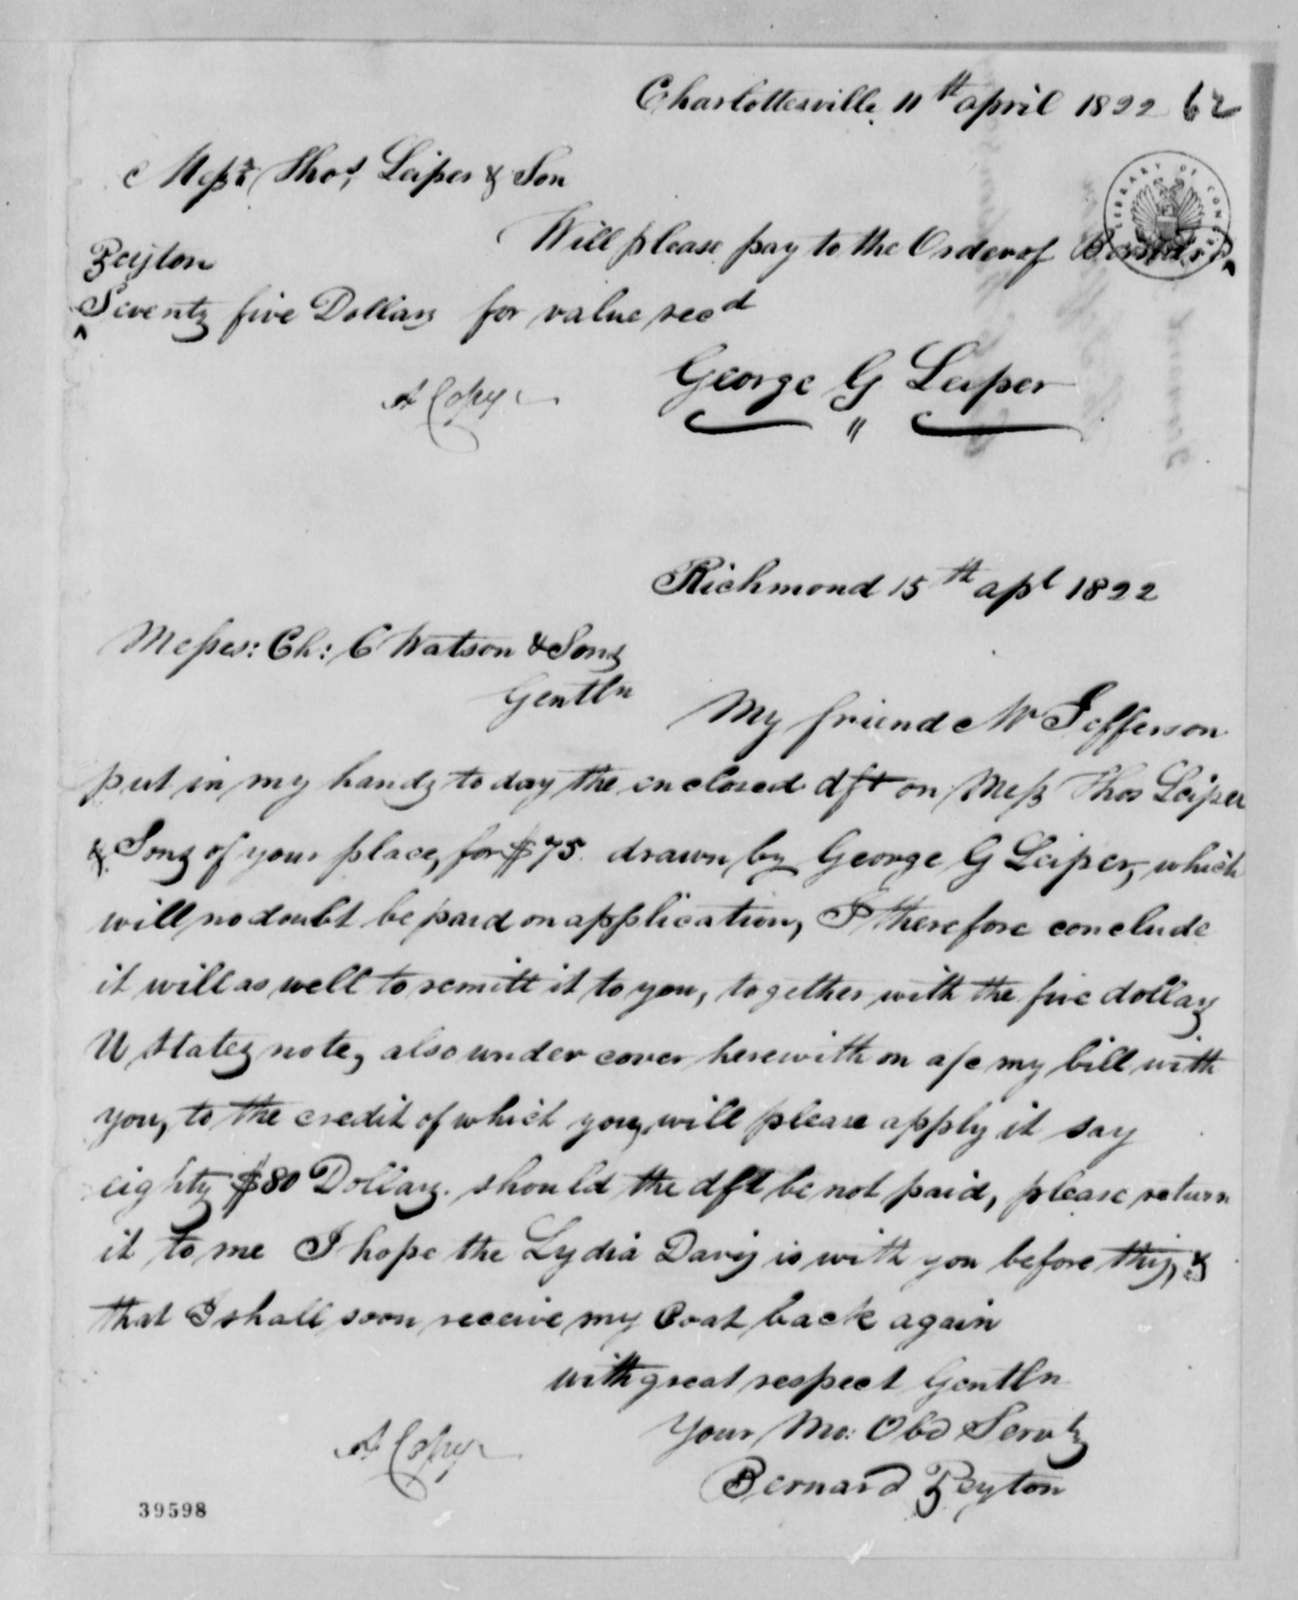 Bernard Peyton to Charles G. Watson & Son, April 15, 1822